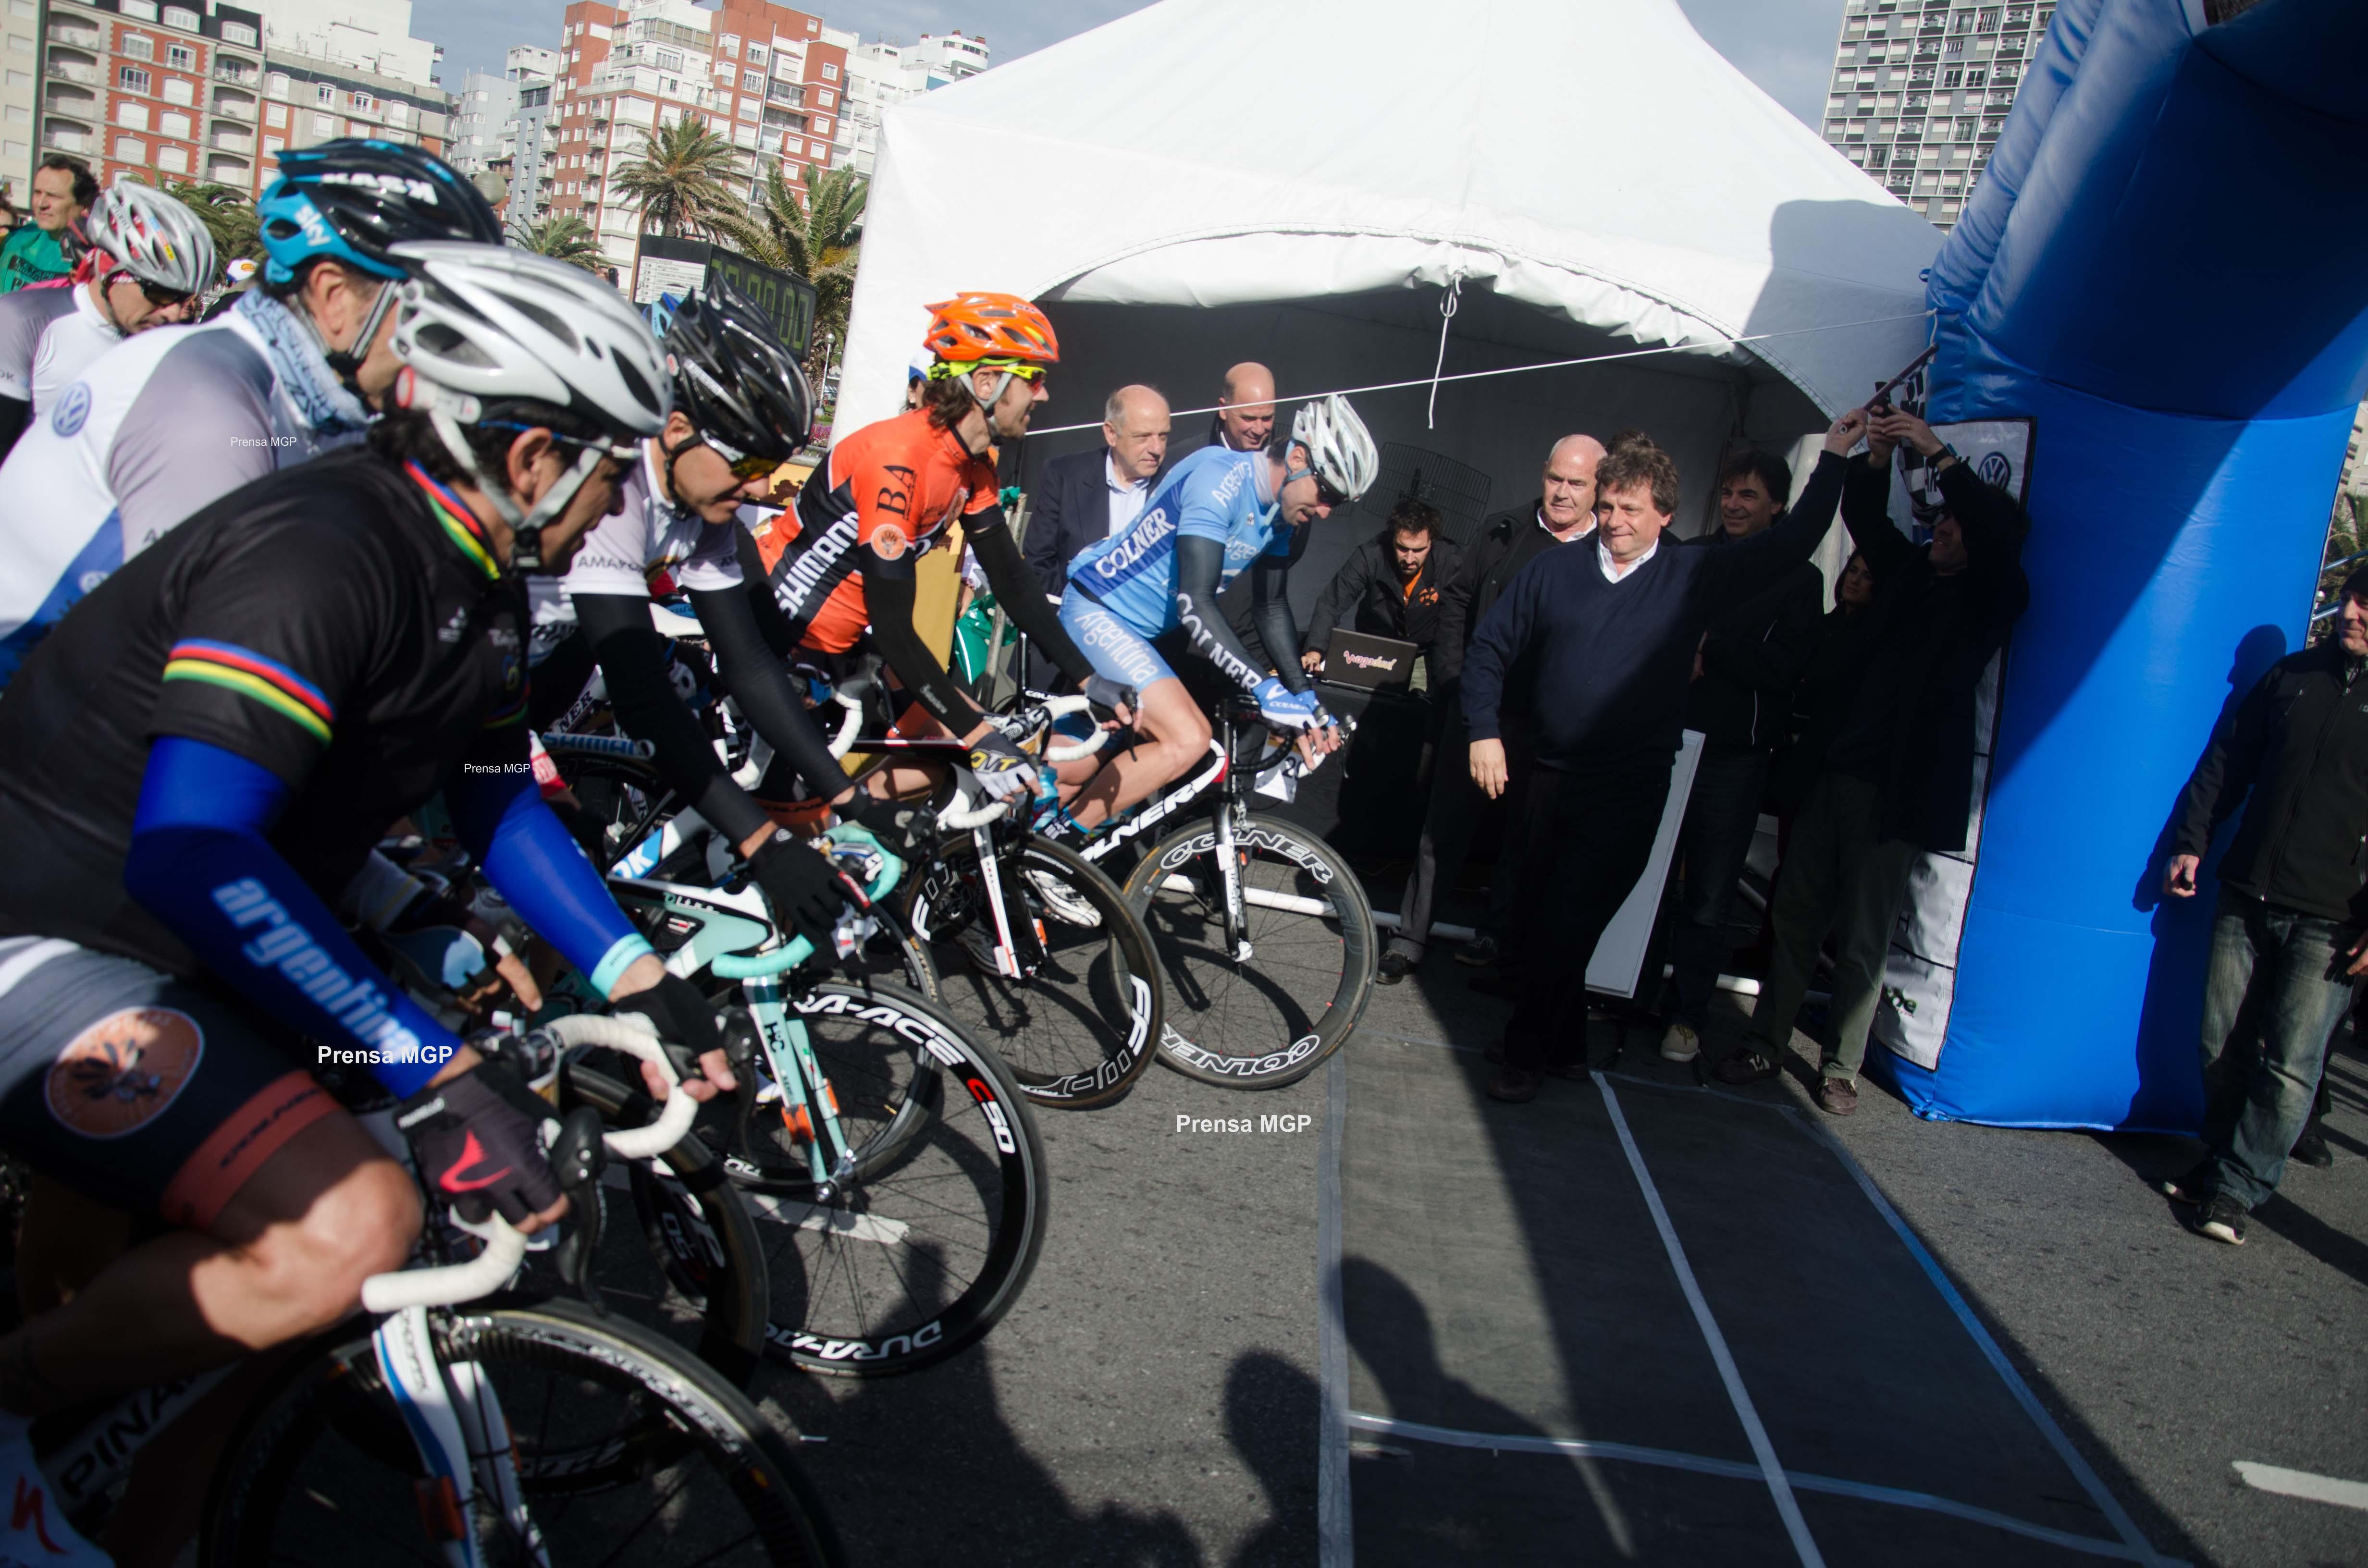 Prensa MGP - Turismo - Deporte - Pulti largada del Tour de France